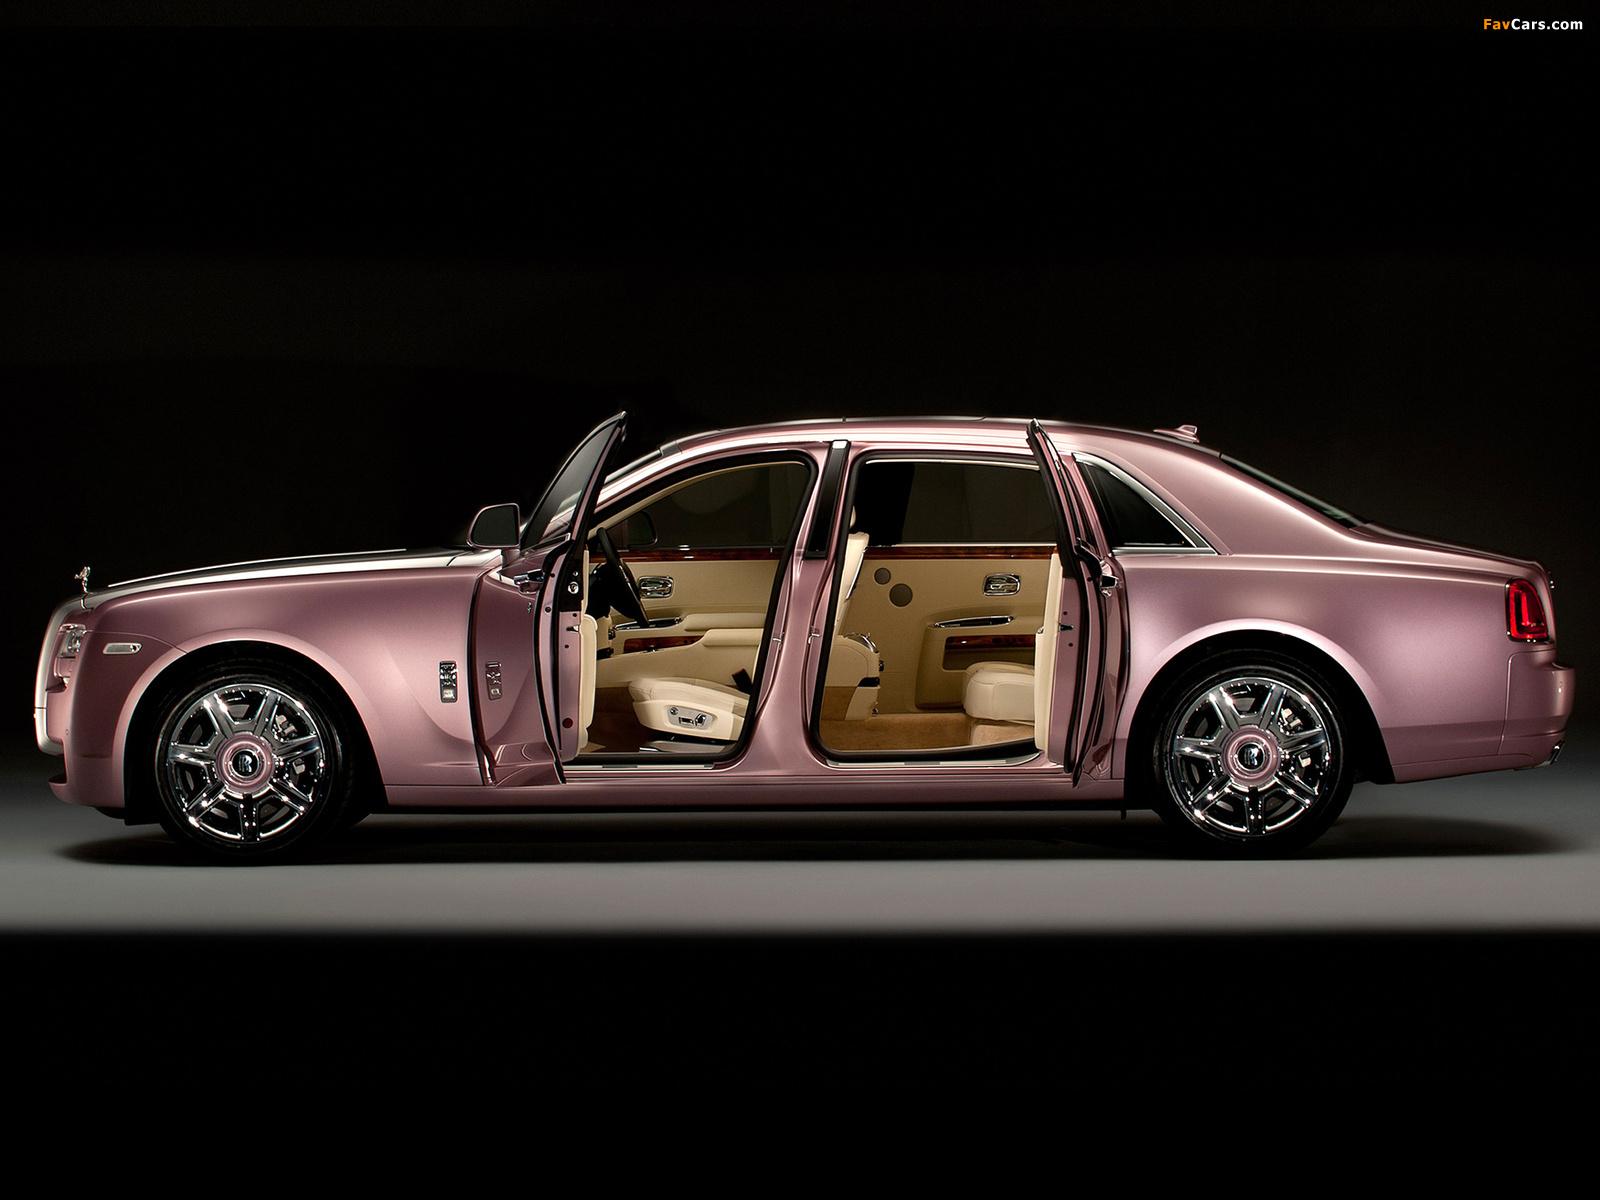 Rose Royce Car Images >> Rolls-Royce Ghost Rose Quartz 2012 wallpapers (1600x1200)